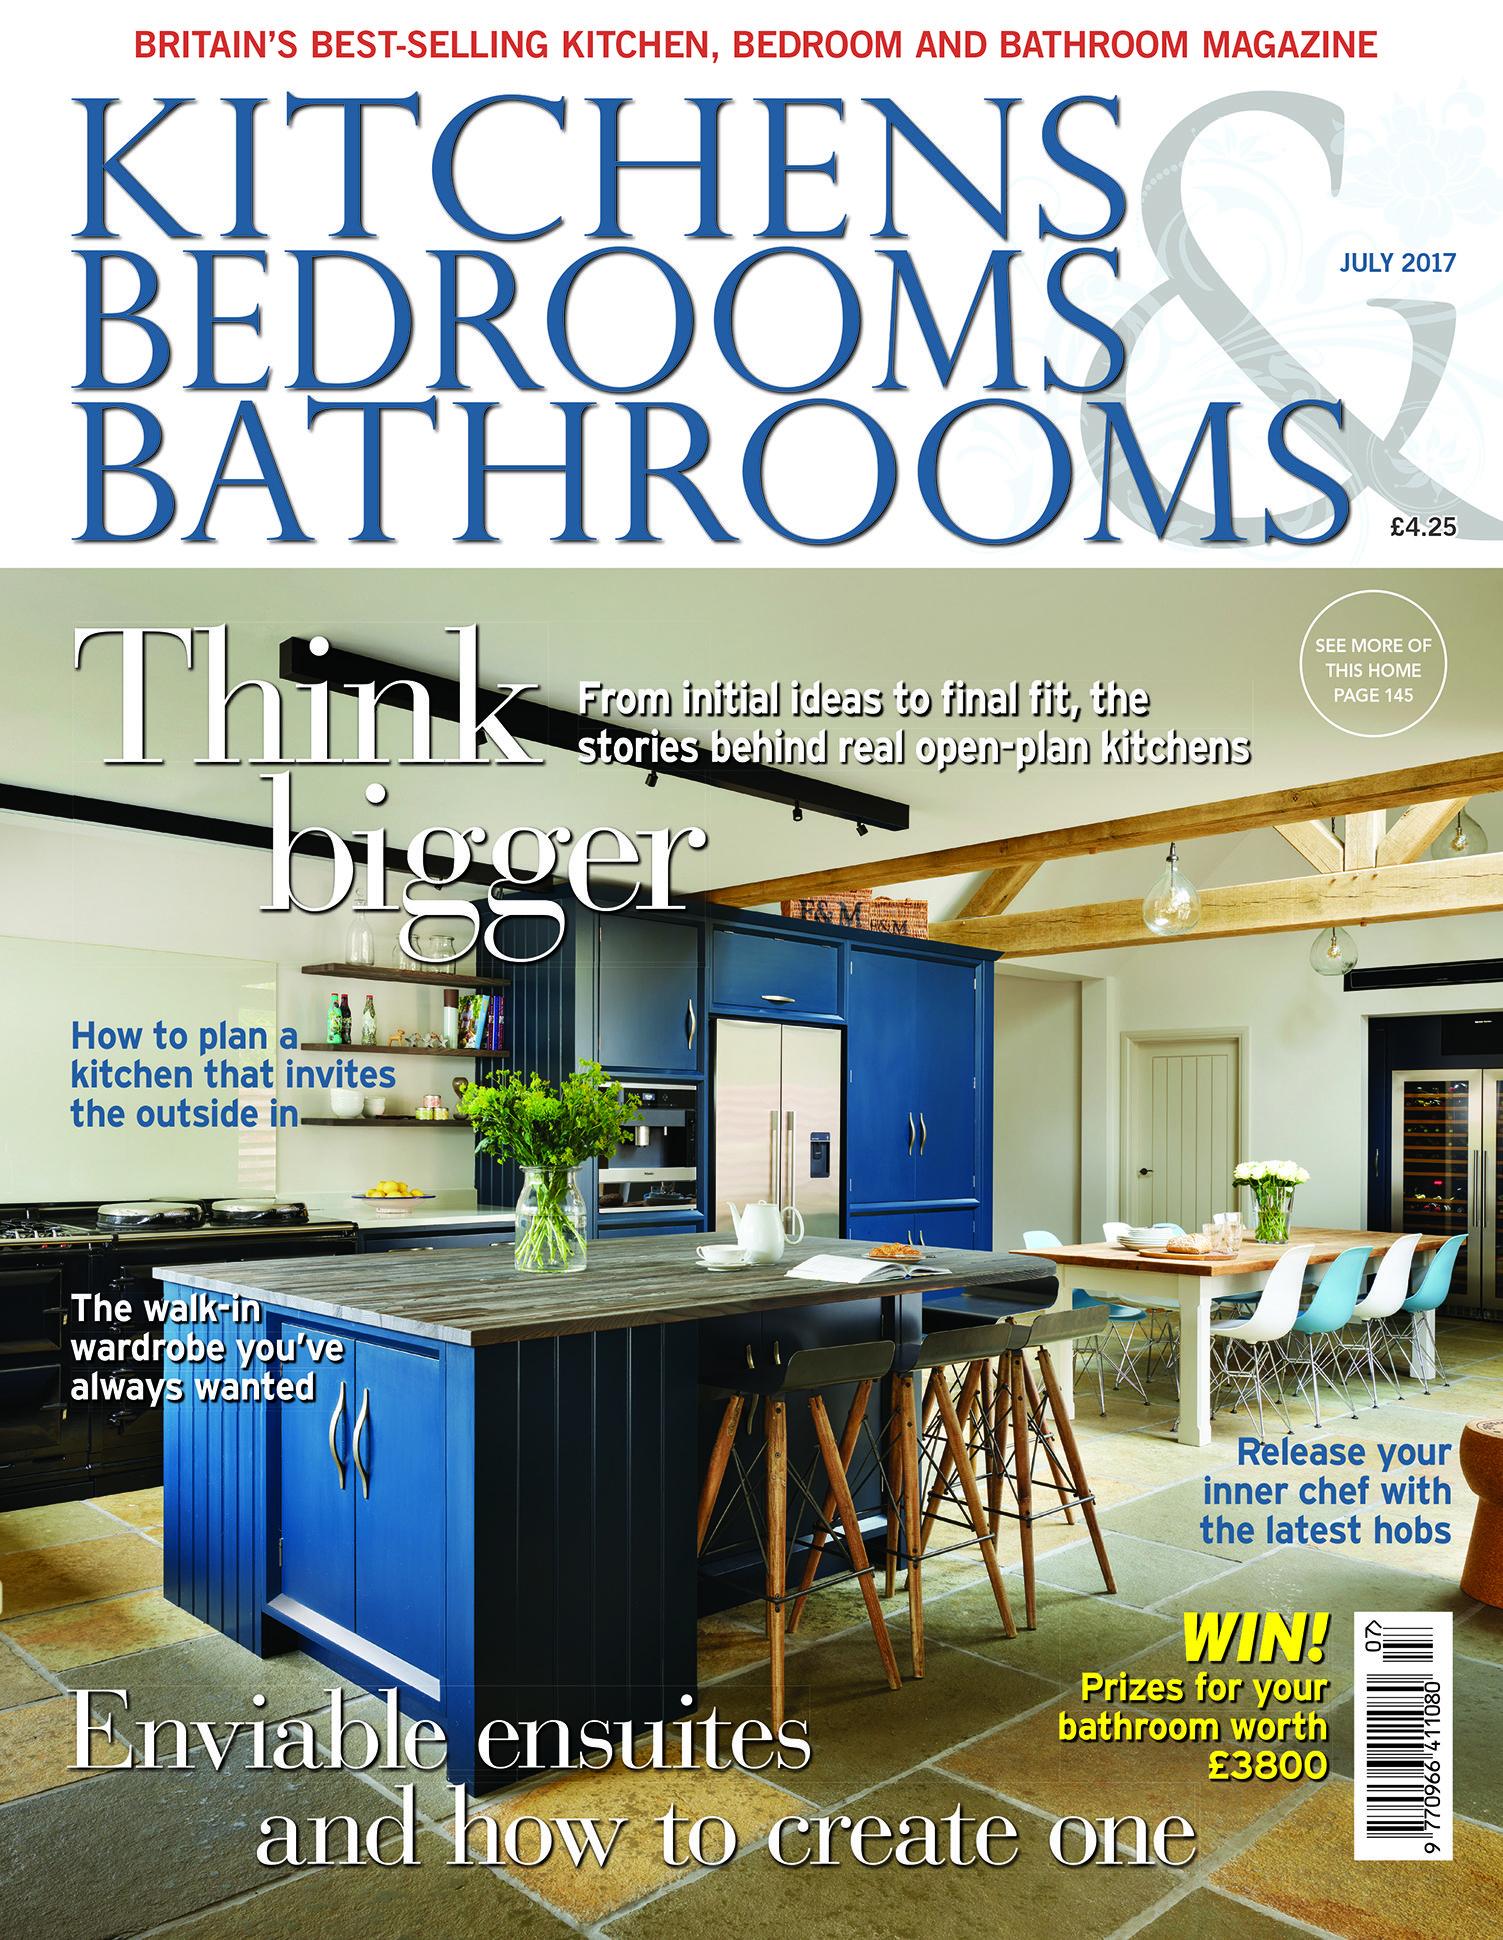 Photos Of Kitchens Bedrooms u Bathrooms magazine July